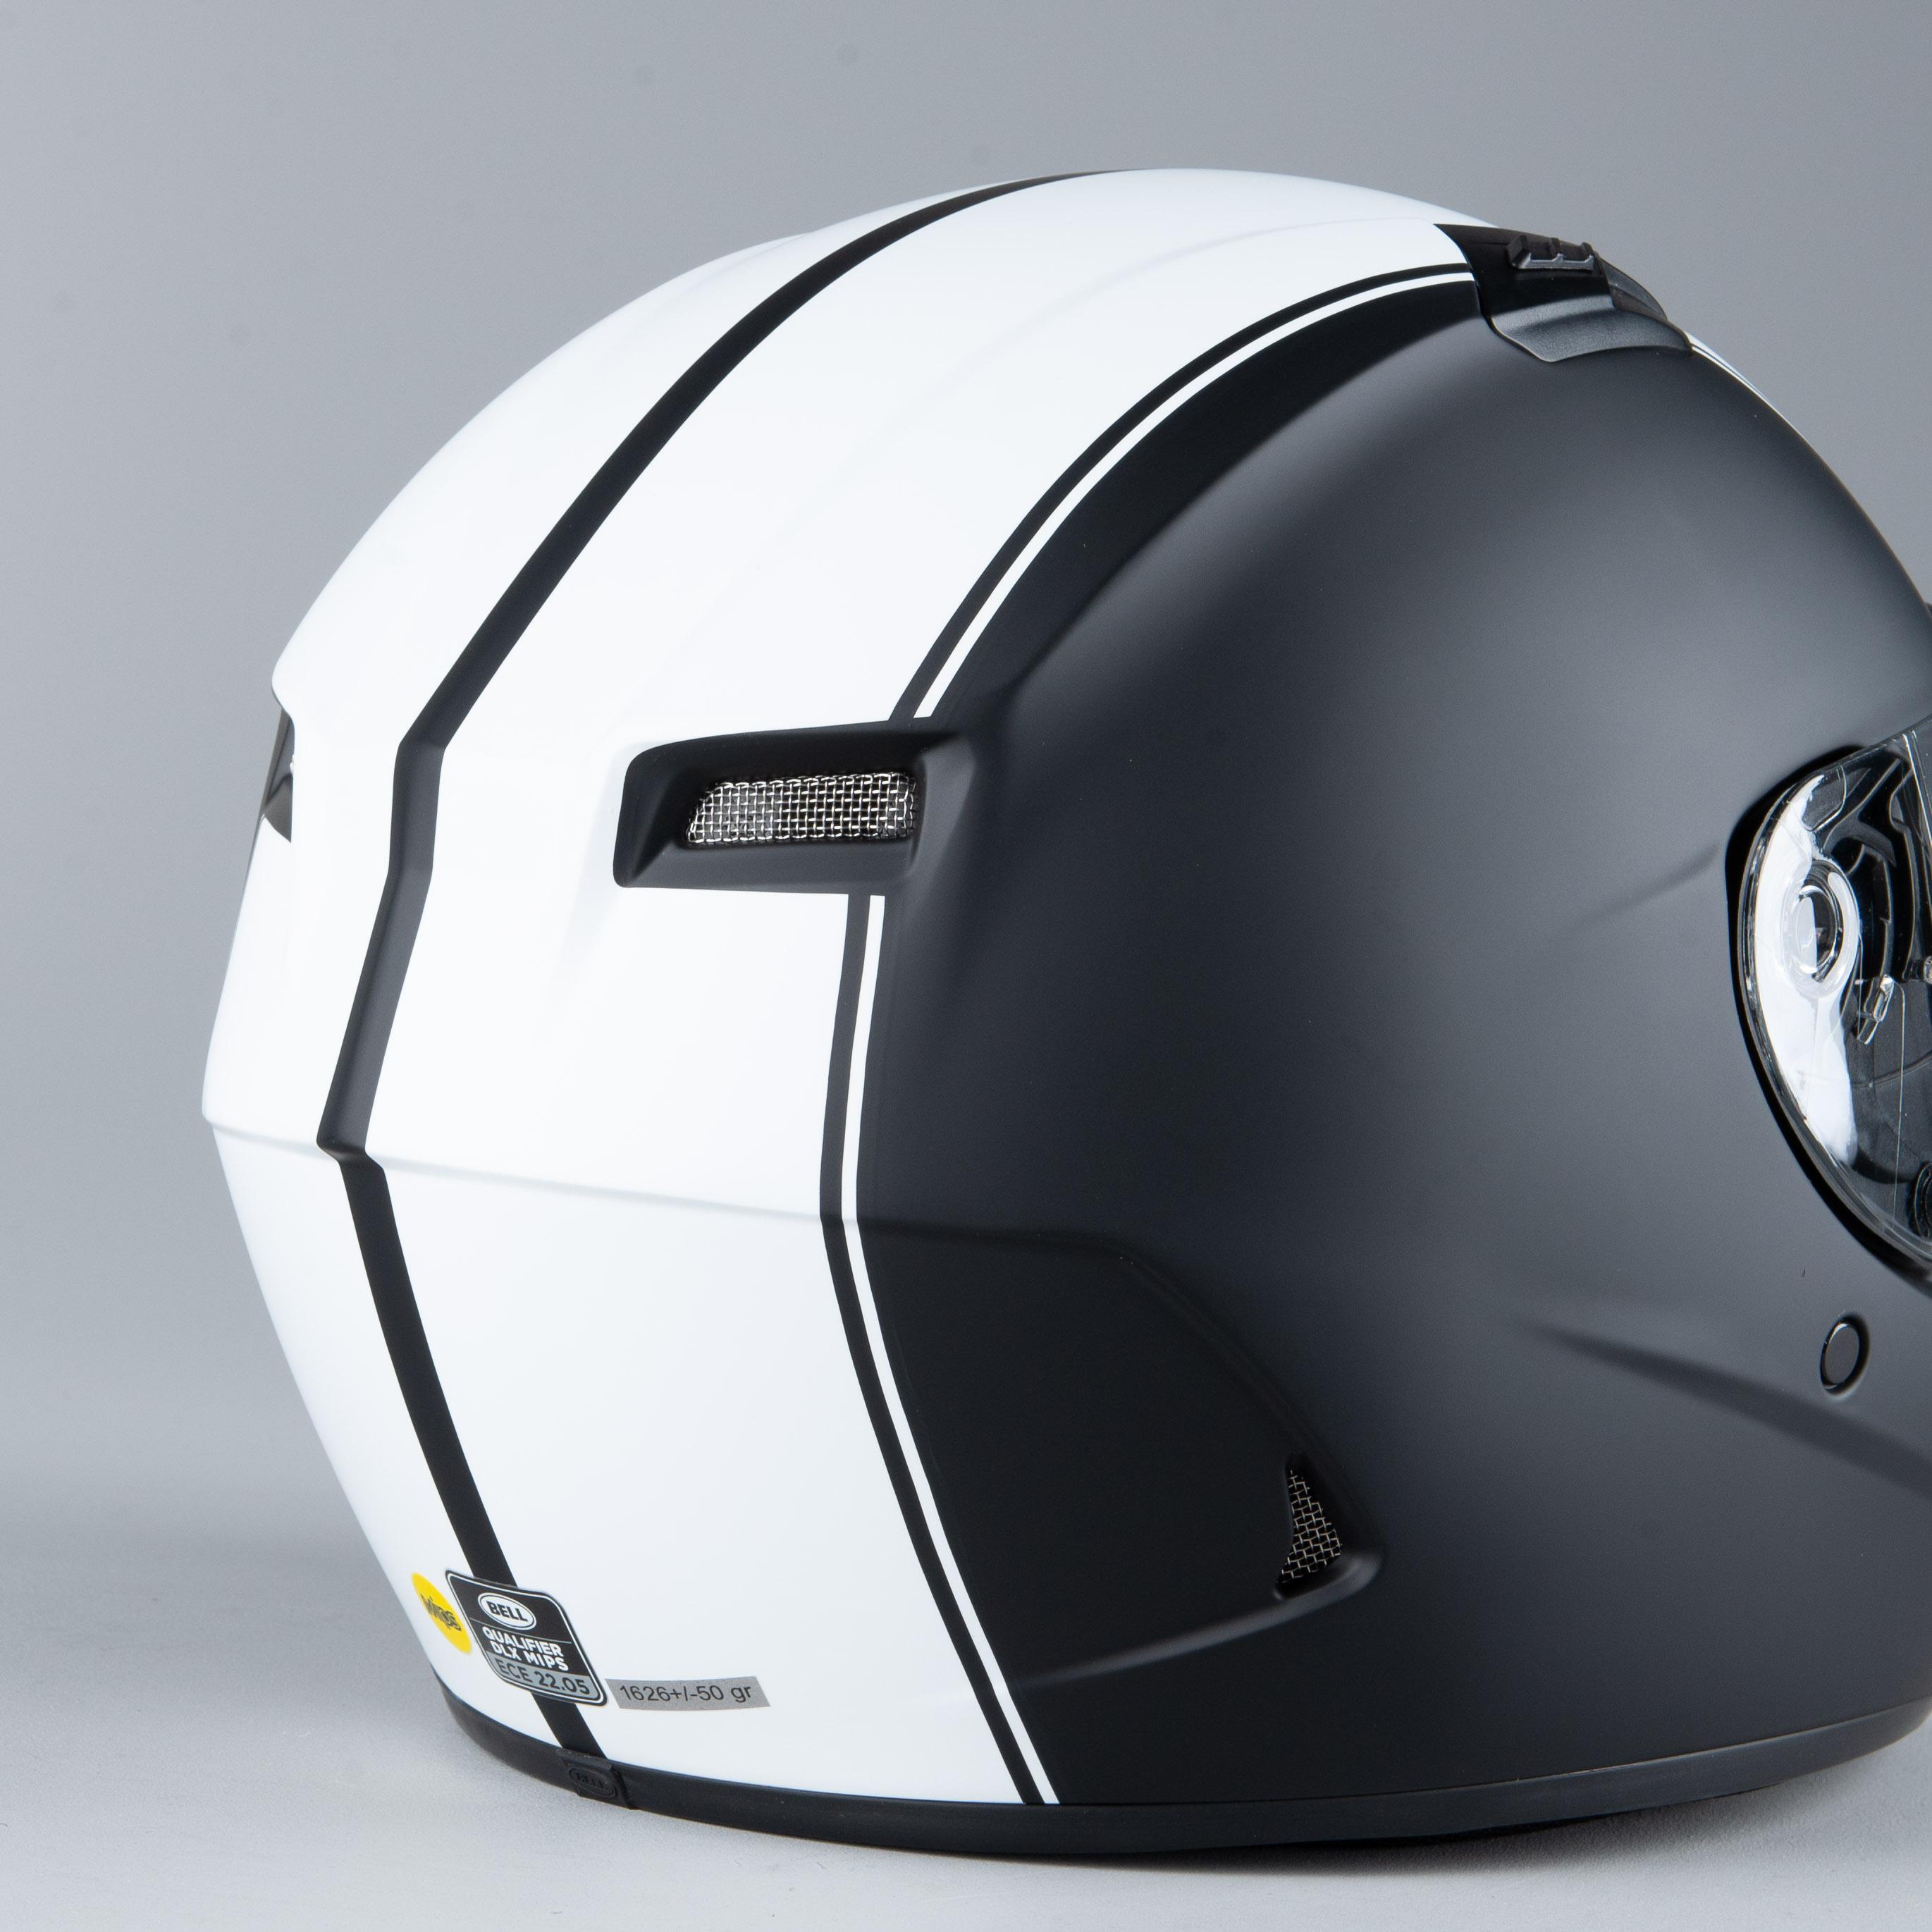 Bell Qualifier DLX MIPS Full Face Motorcycle Helmet Solid Matte Black